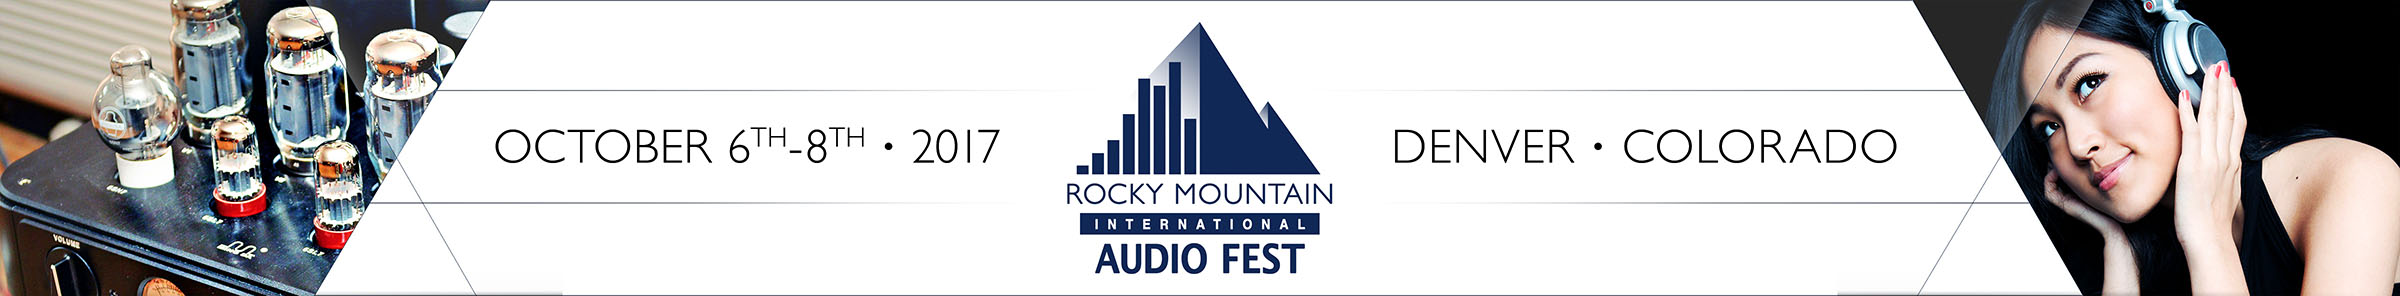 Rocky Mountain Audio Fest 2017